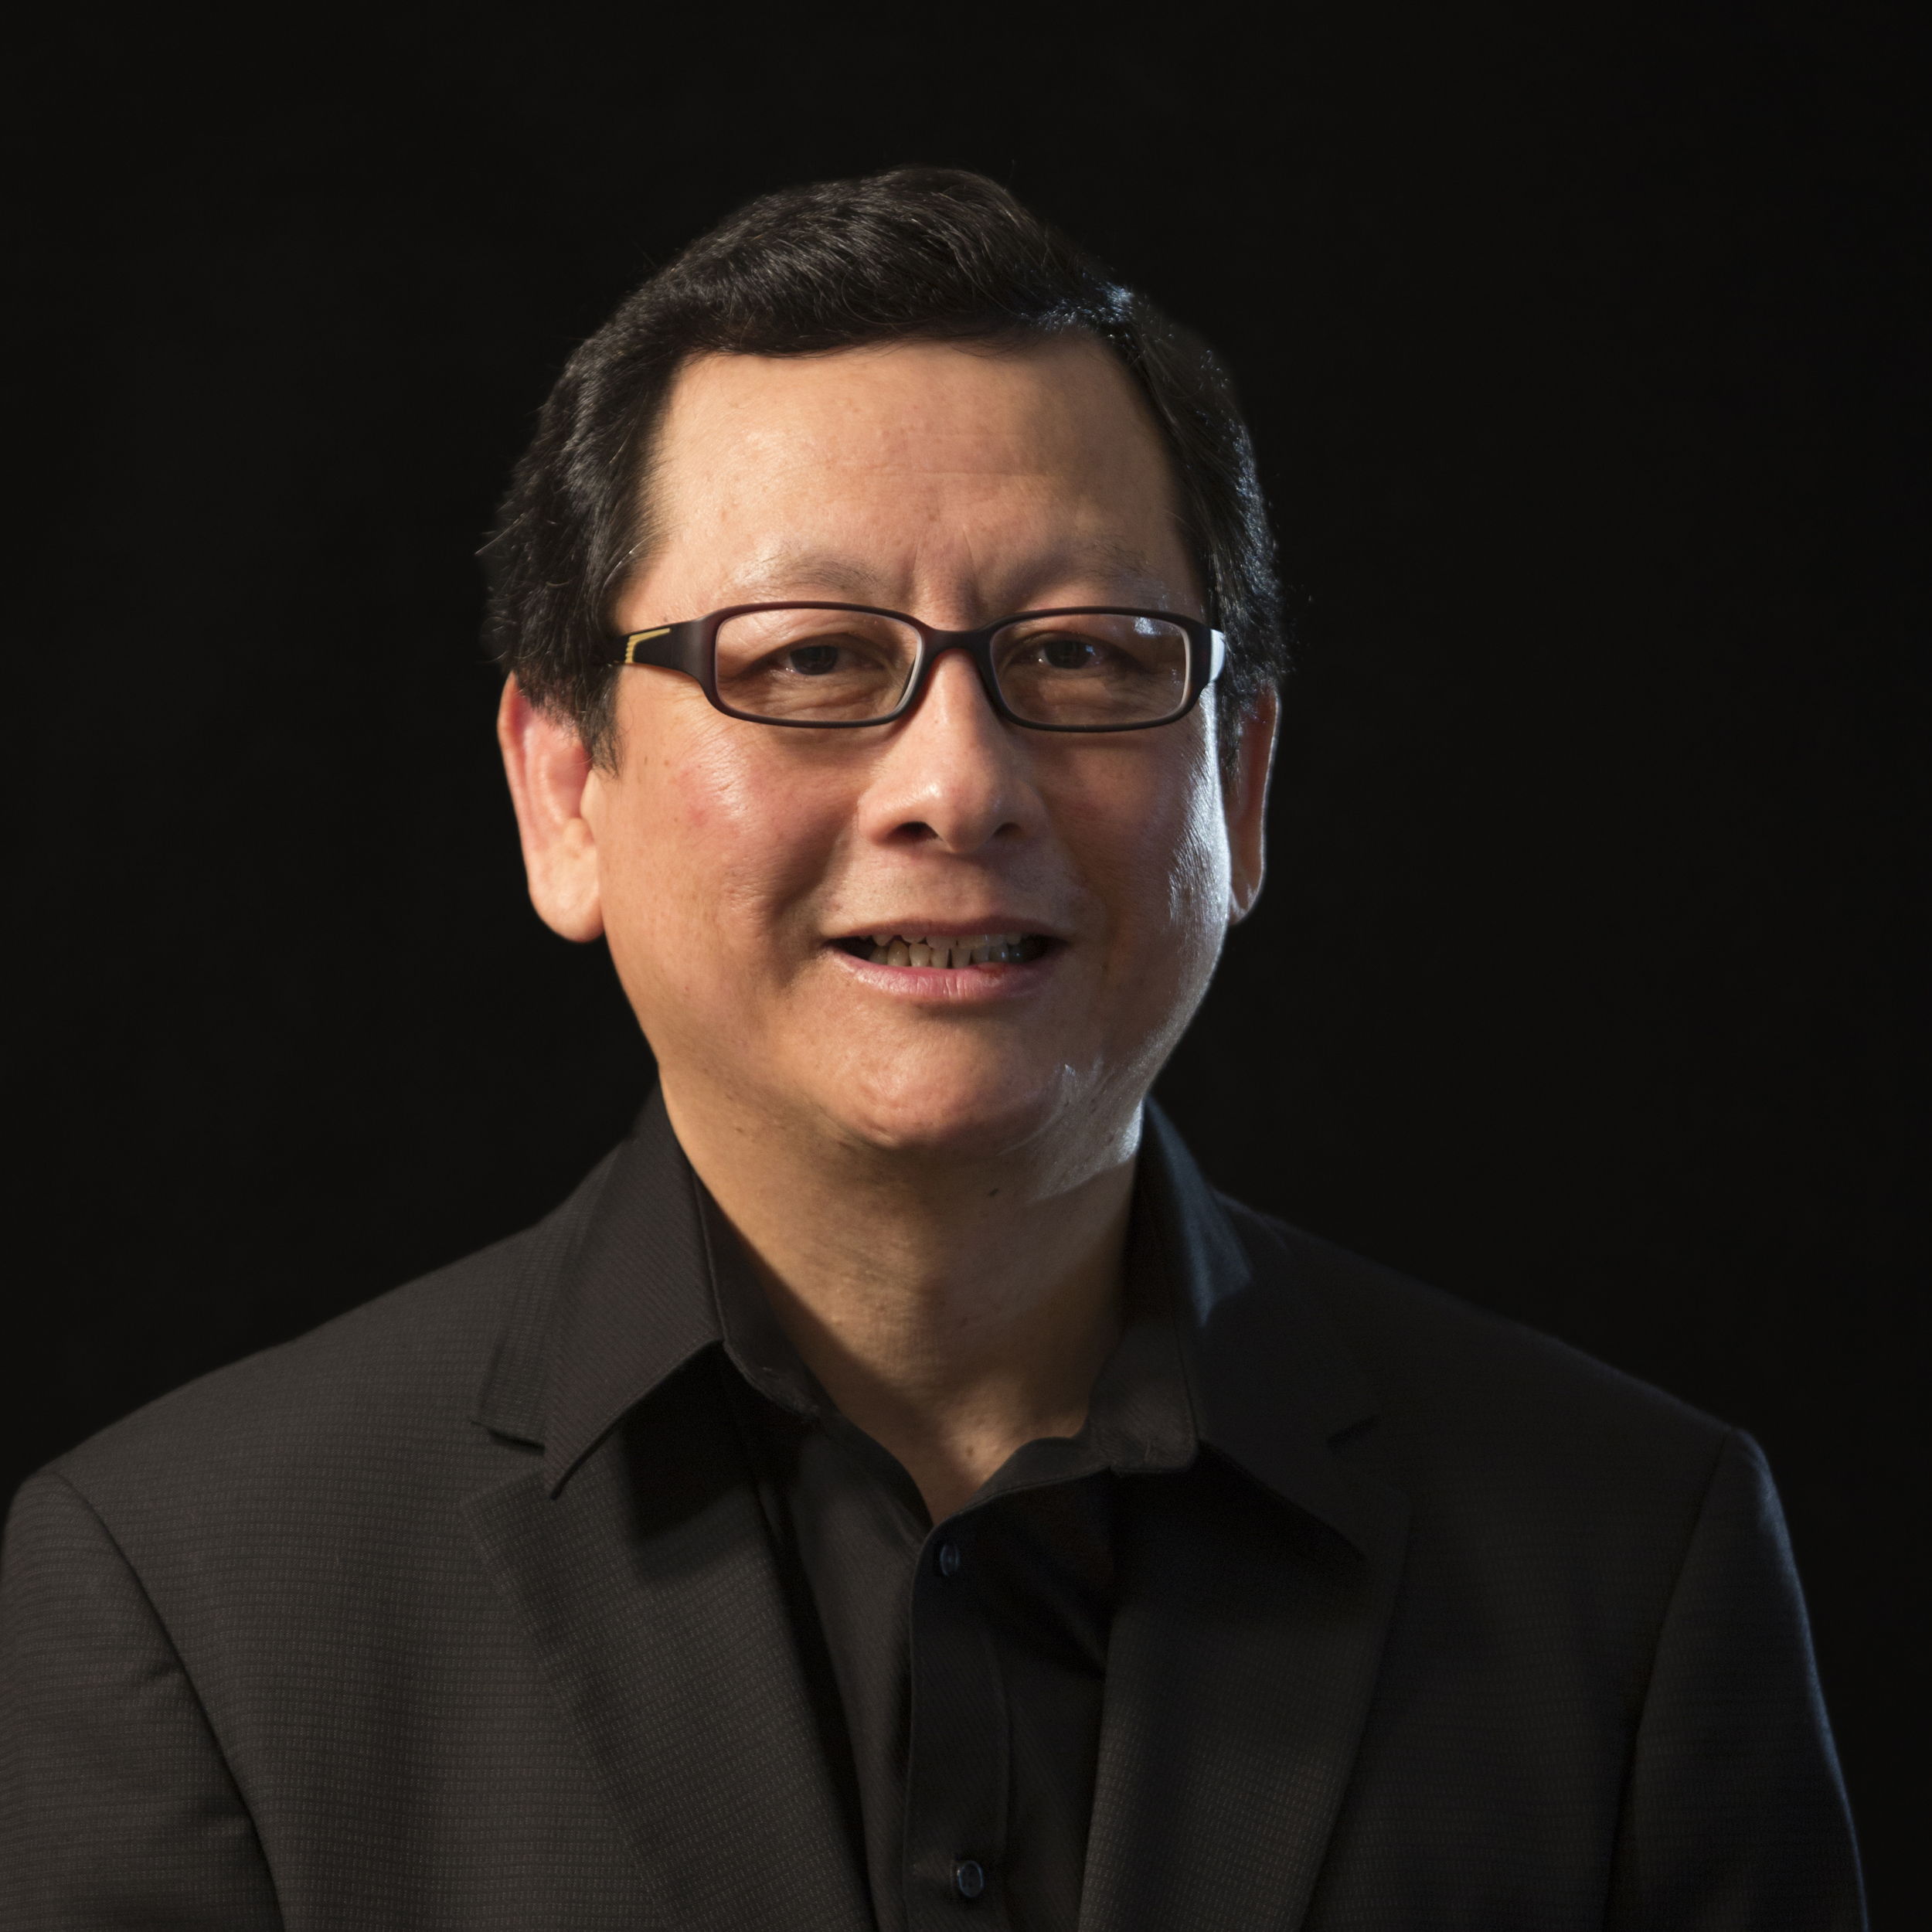 Pastor Liew Yean Huat